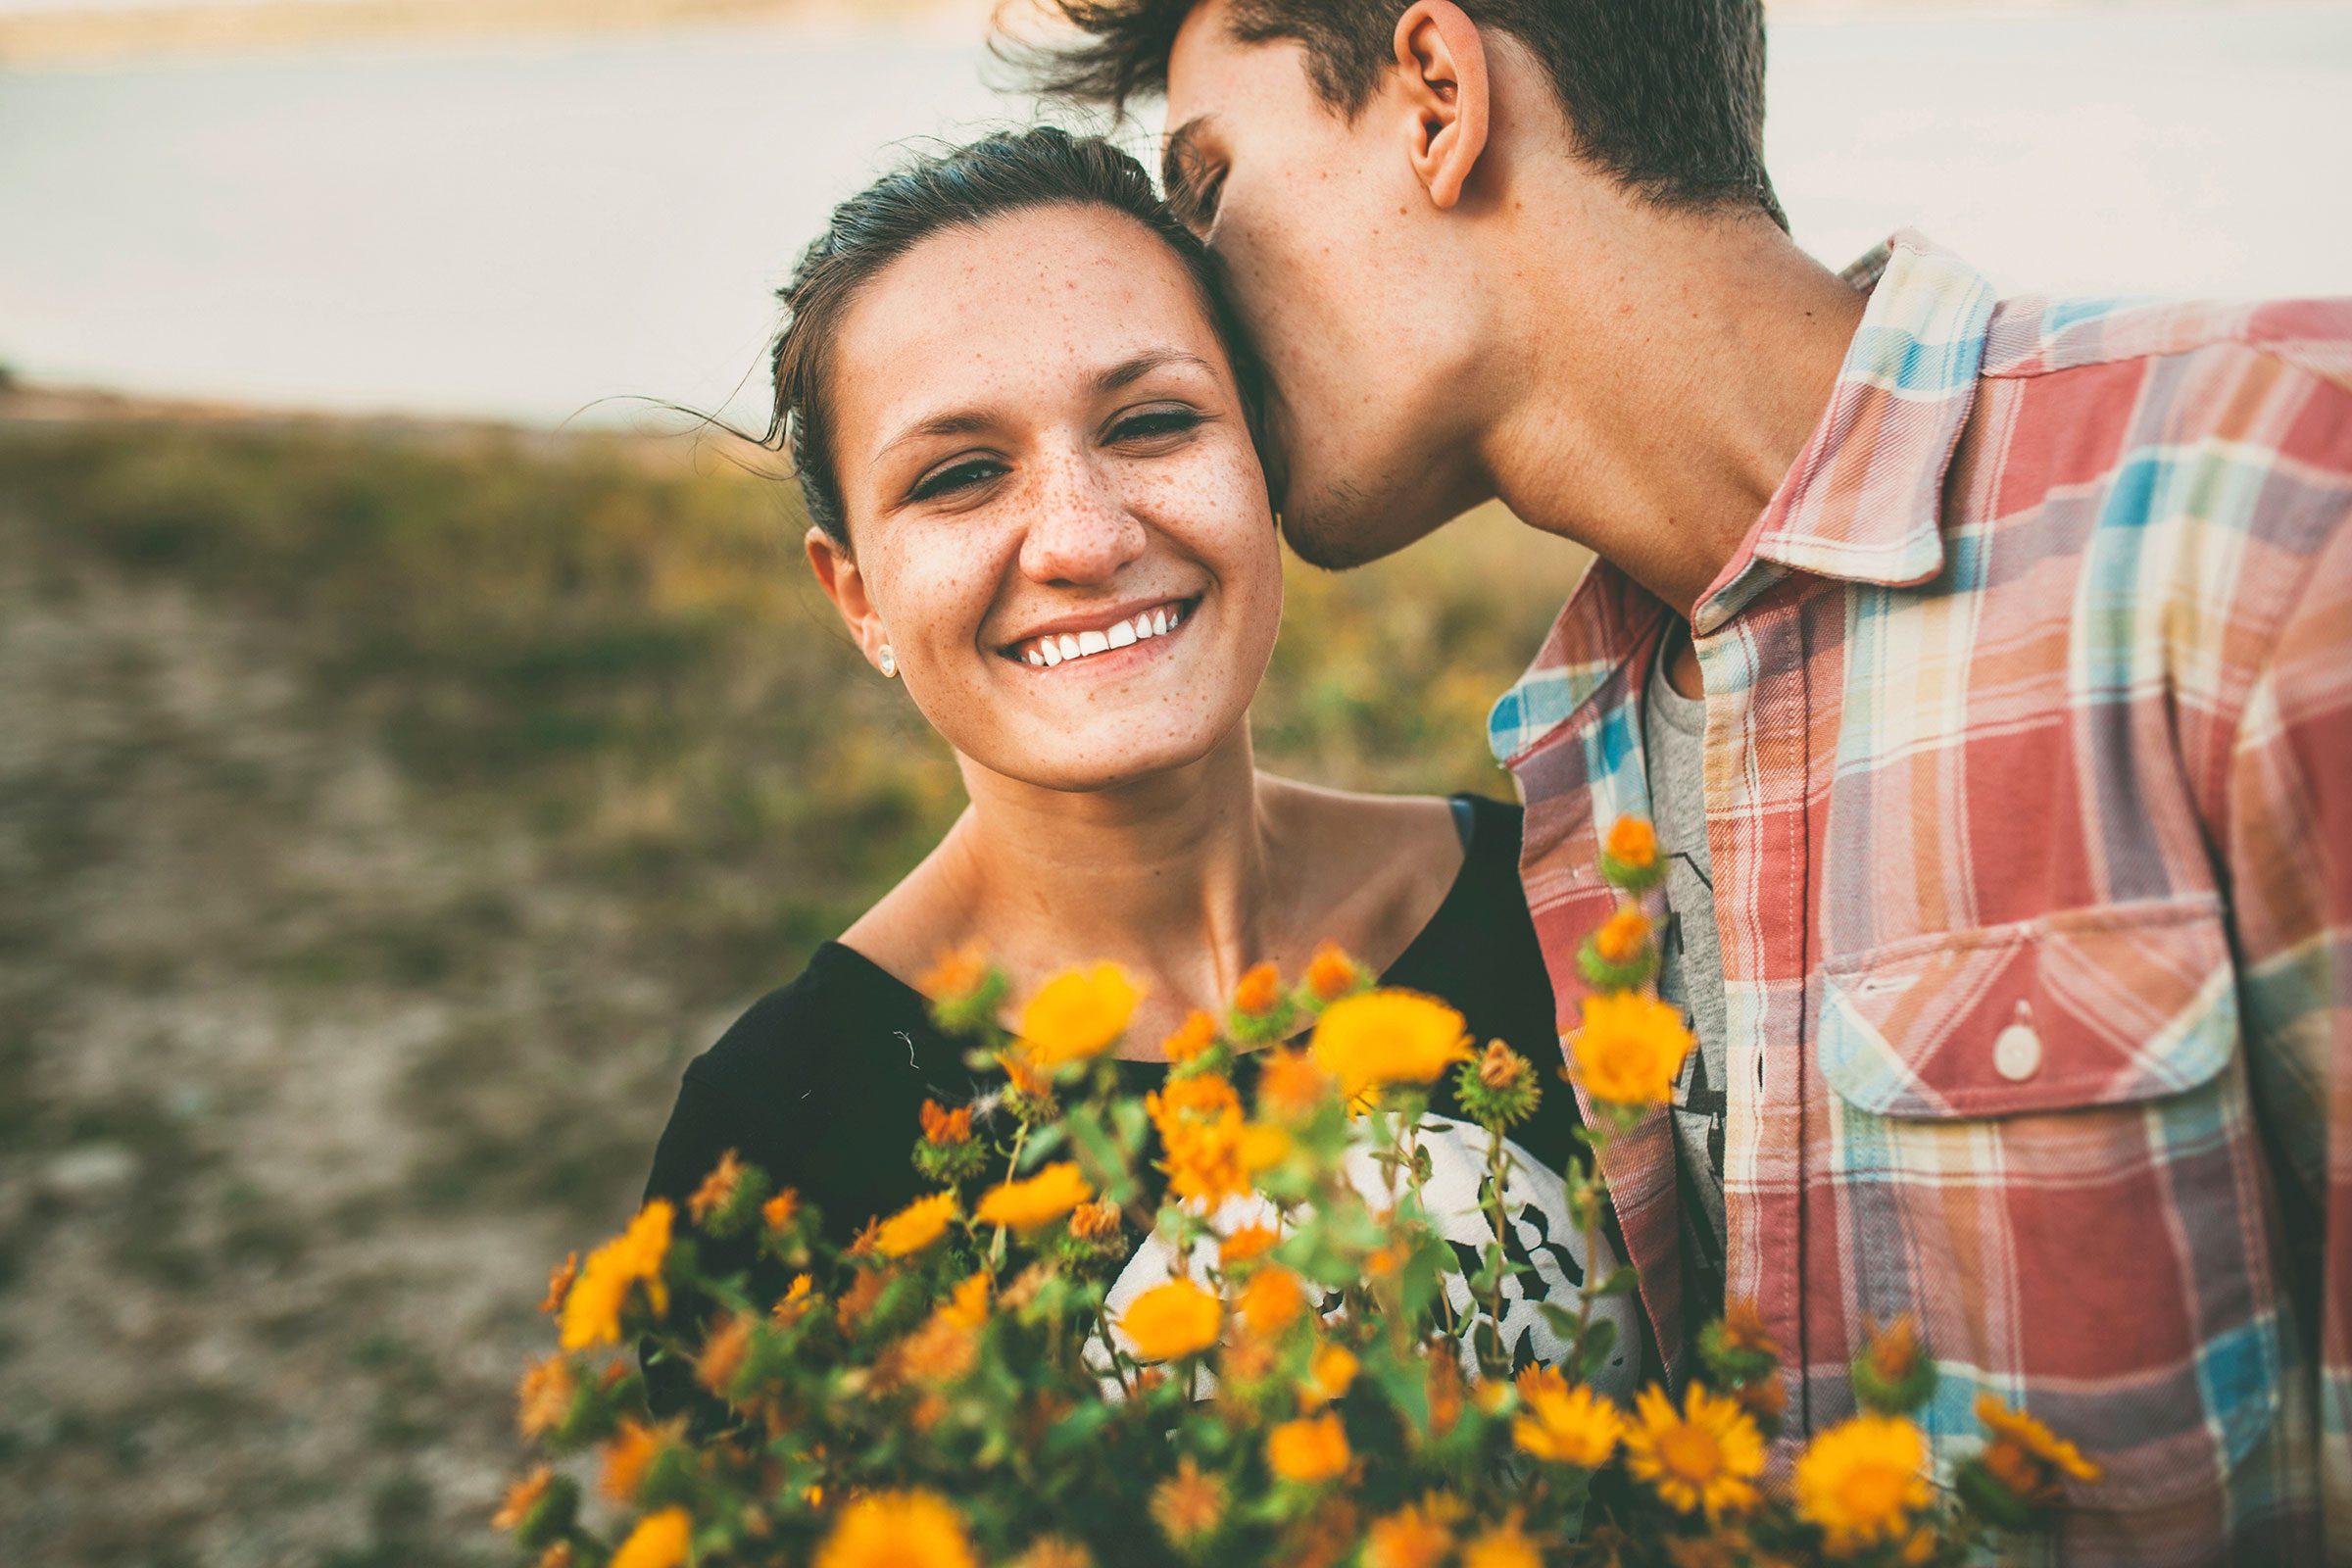 Lolsnaps.com - Introvert dating ritual